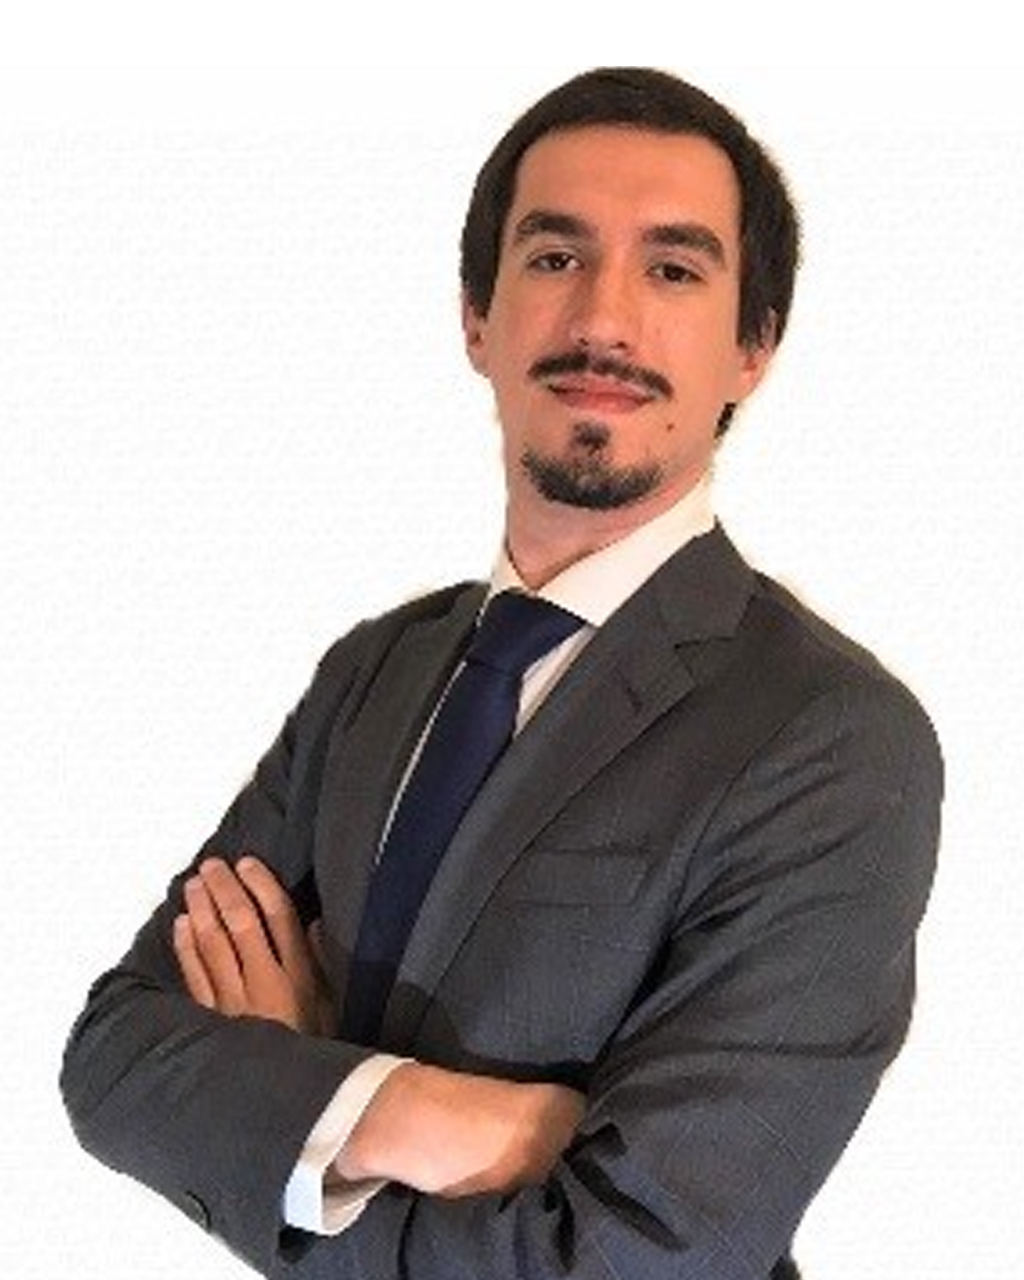 Marco Dias Vieira